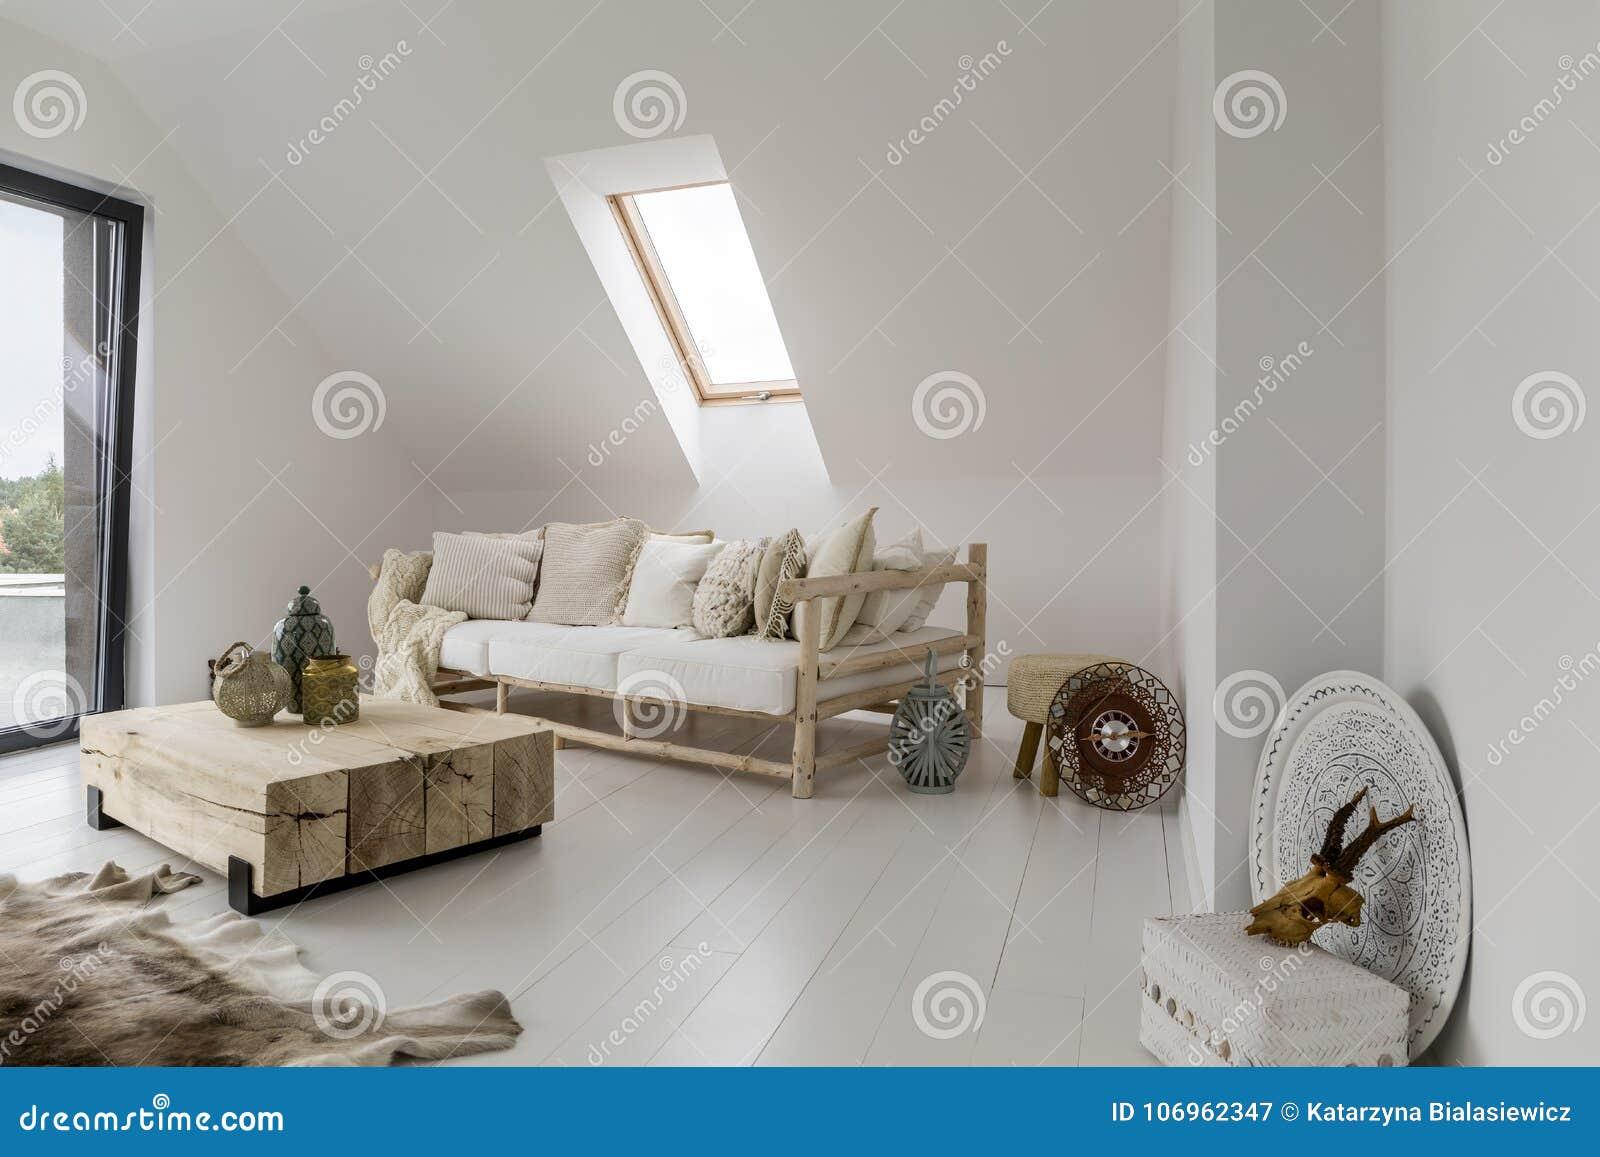 Rustic Living Room With Lantern Stock Image Image Of Lantern Living 106962347